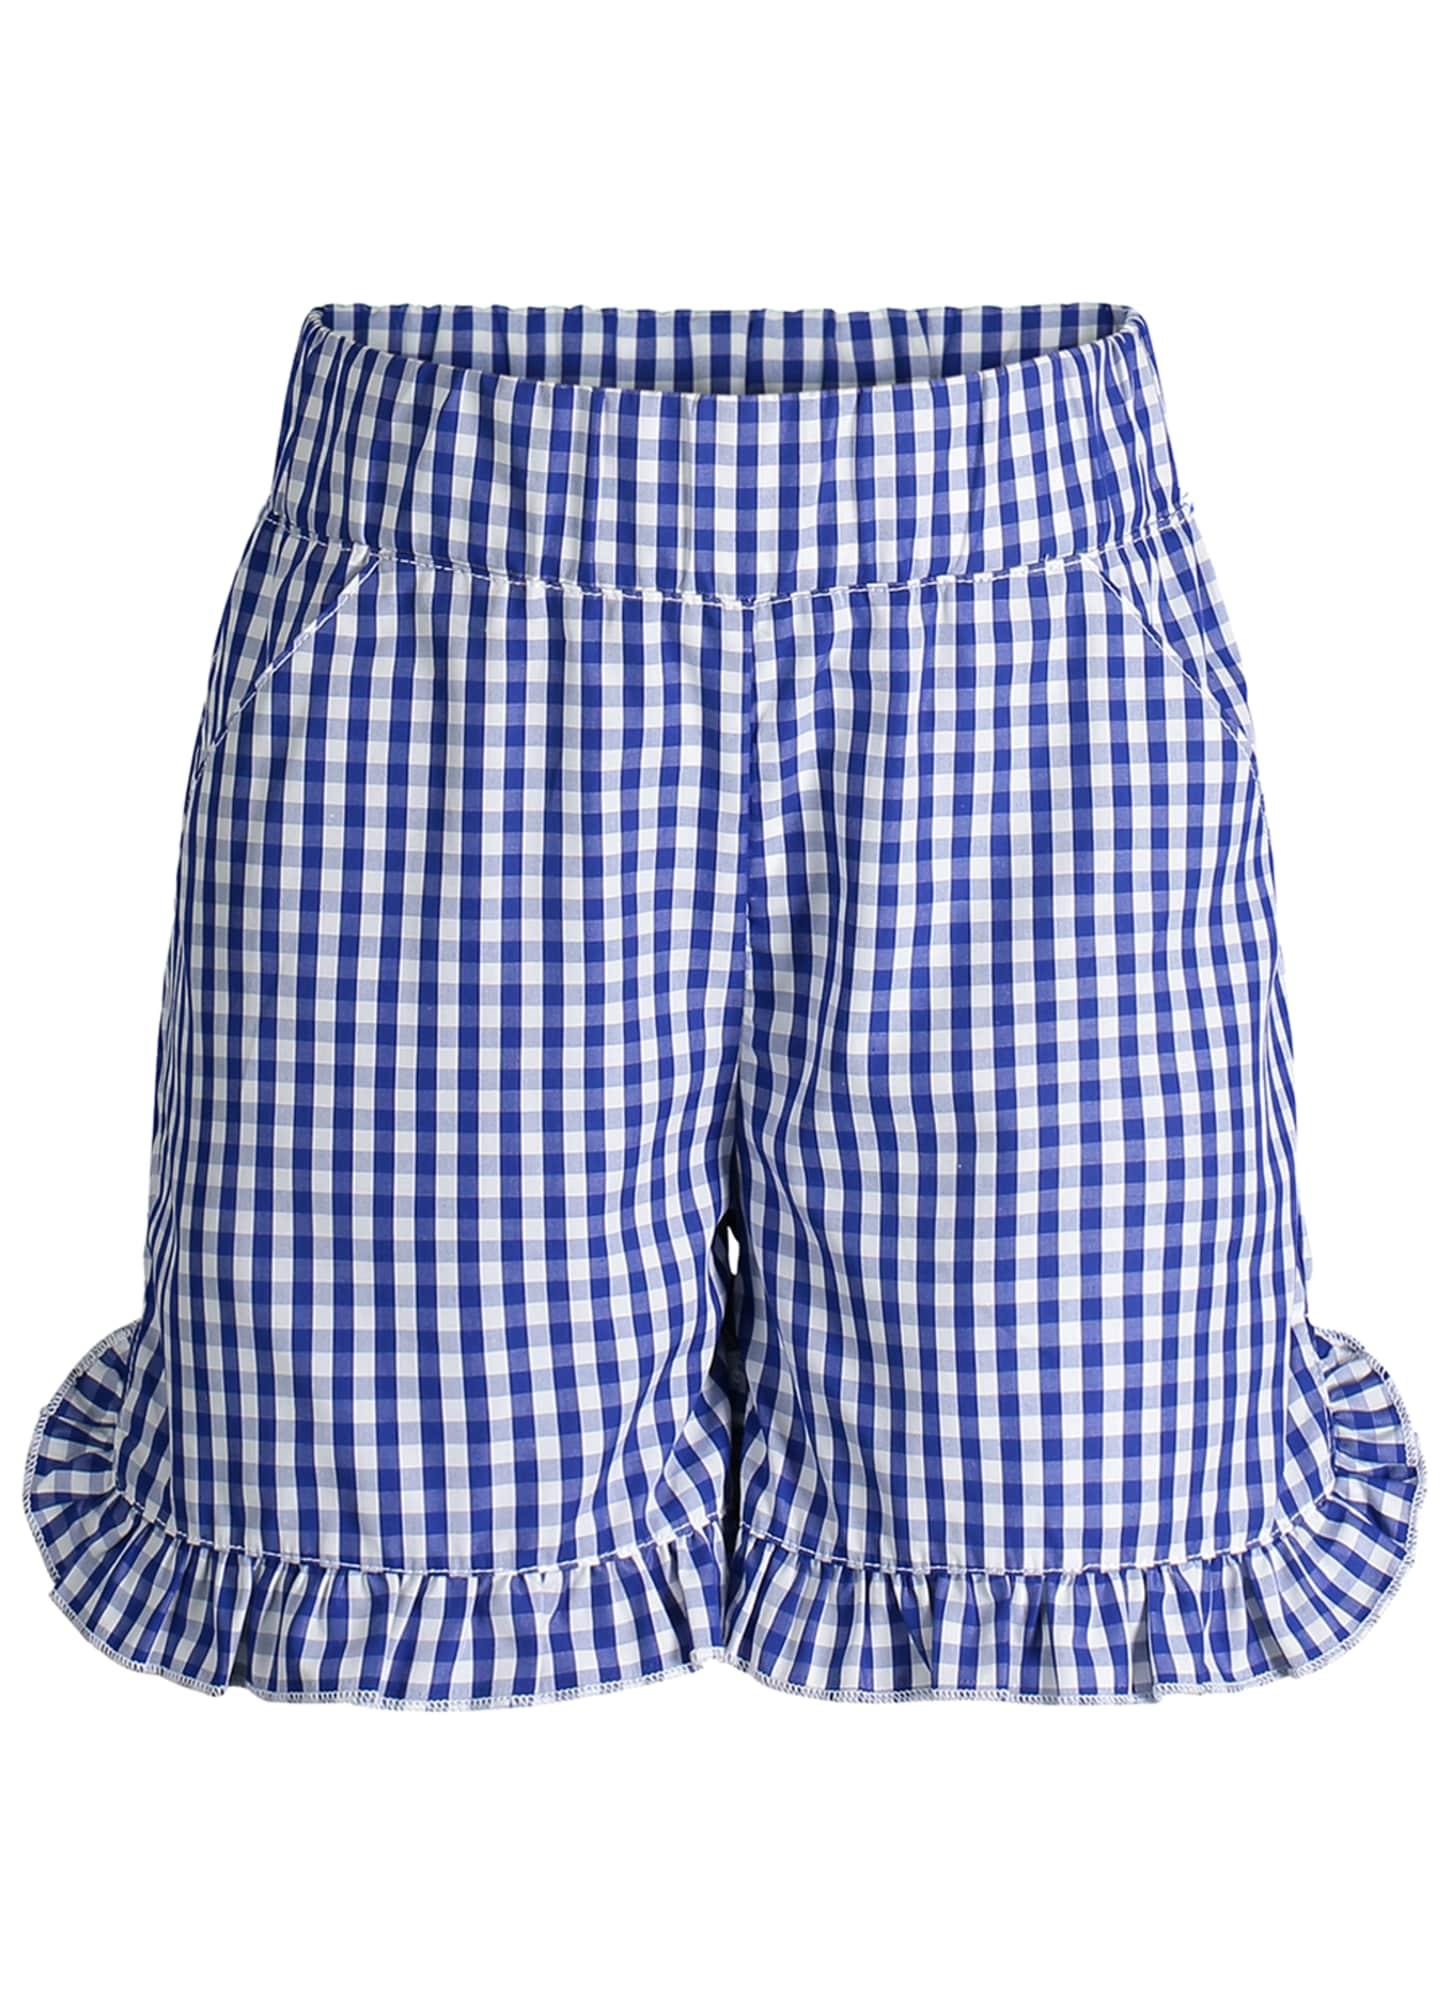 Andy & Evan Ruffle Hem Gingham Shorts, Size